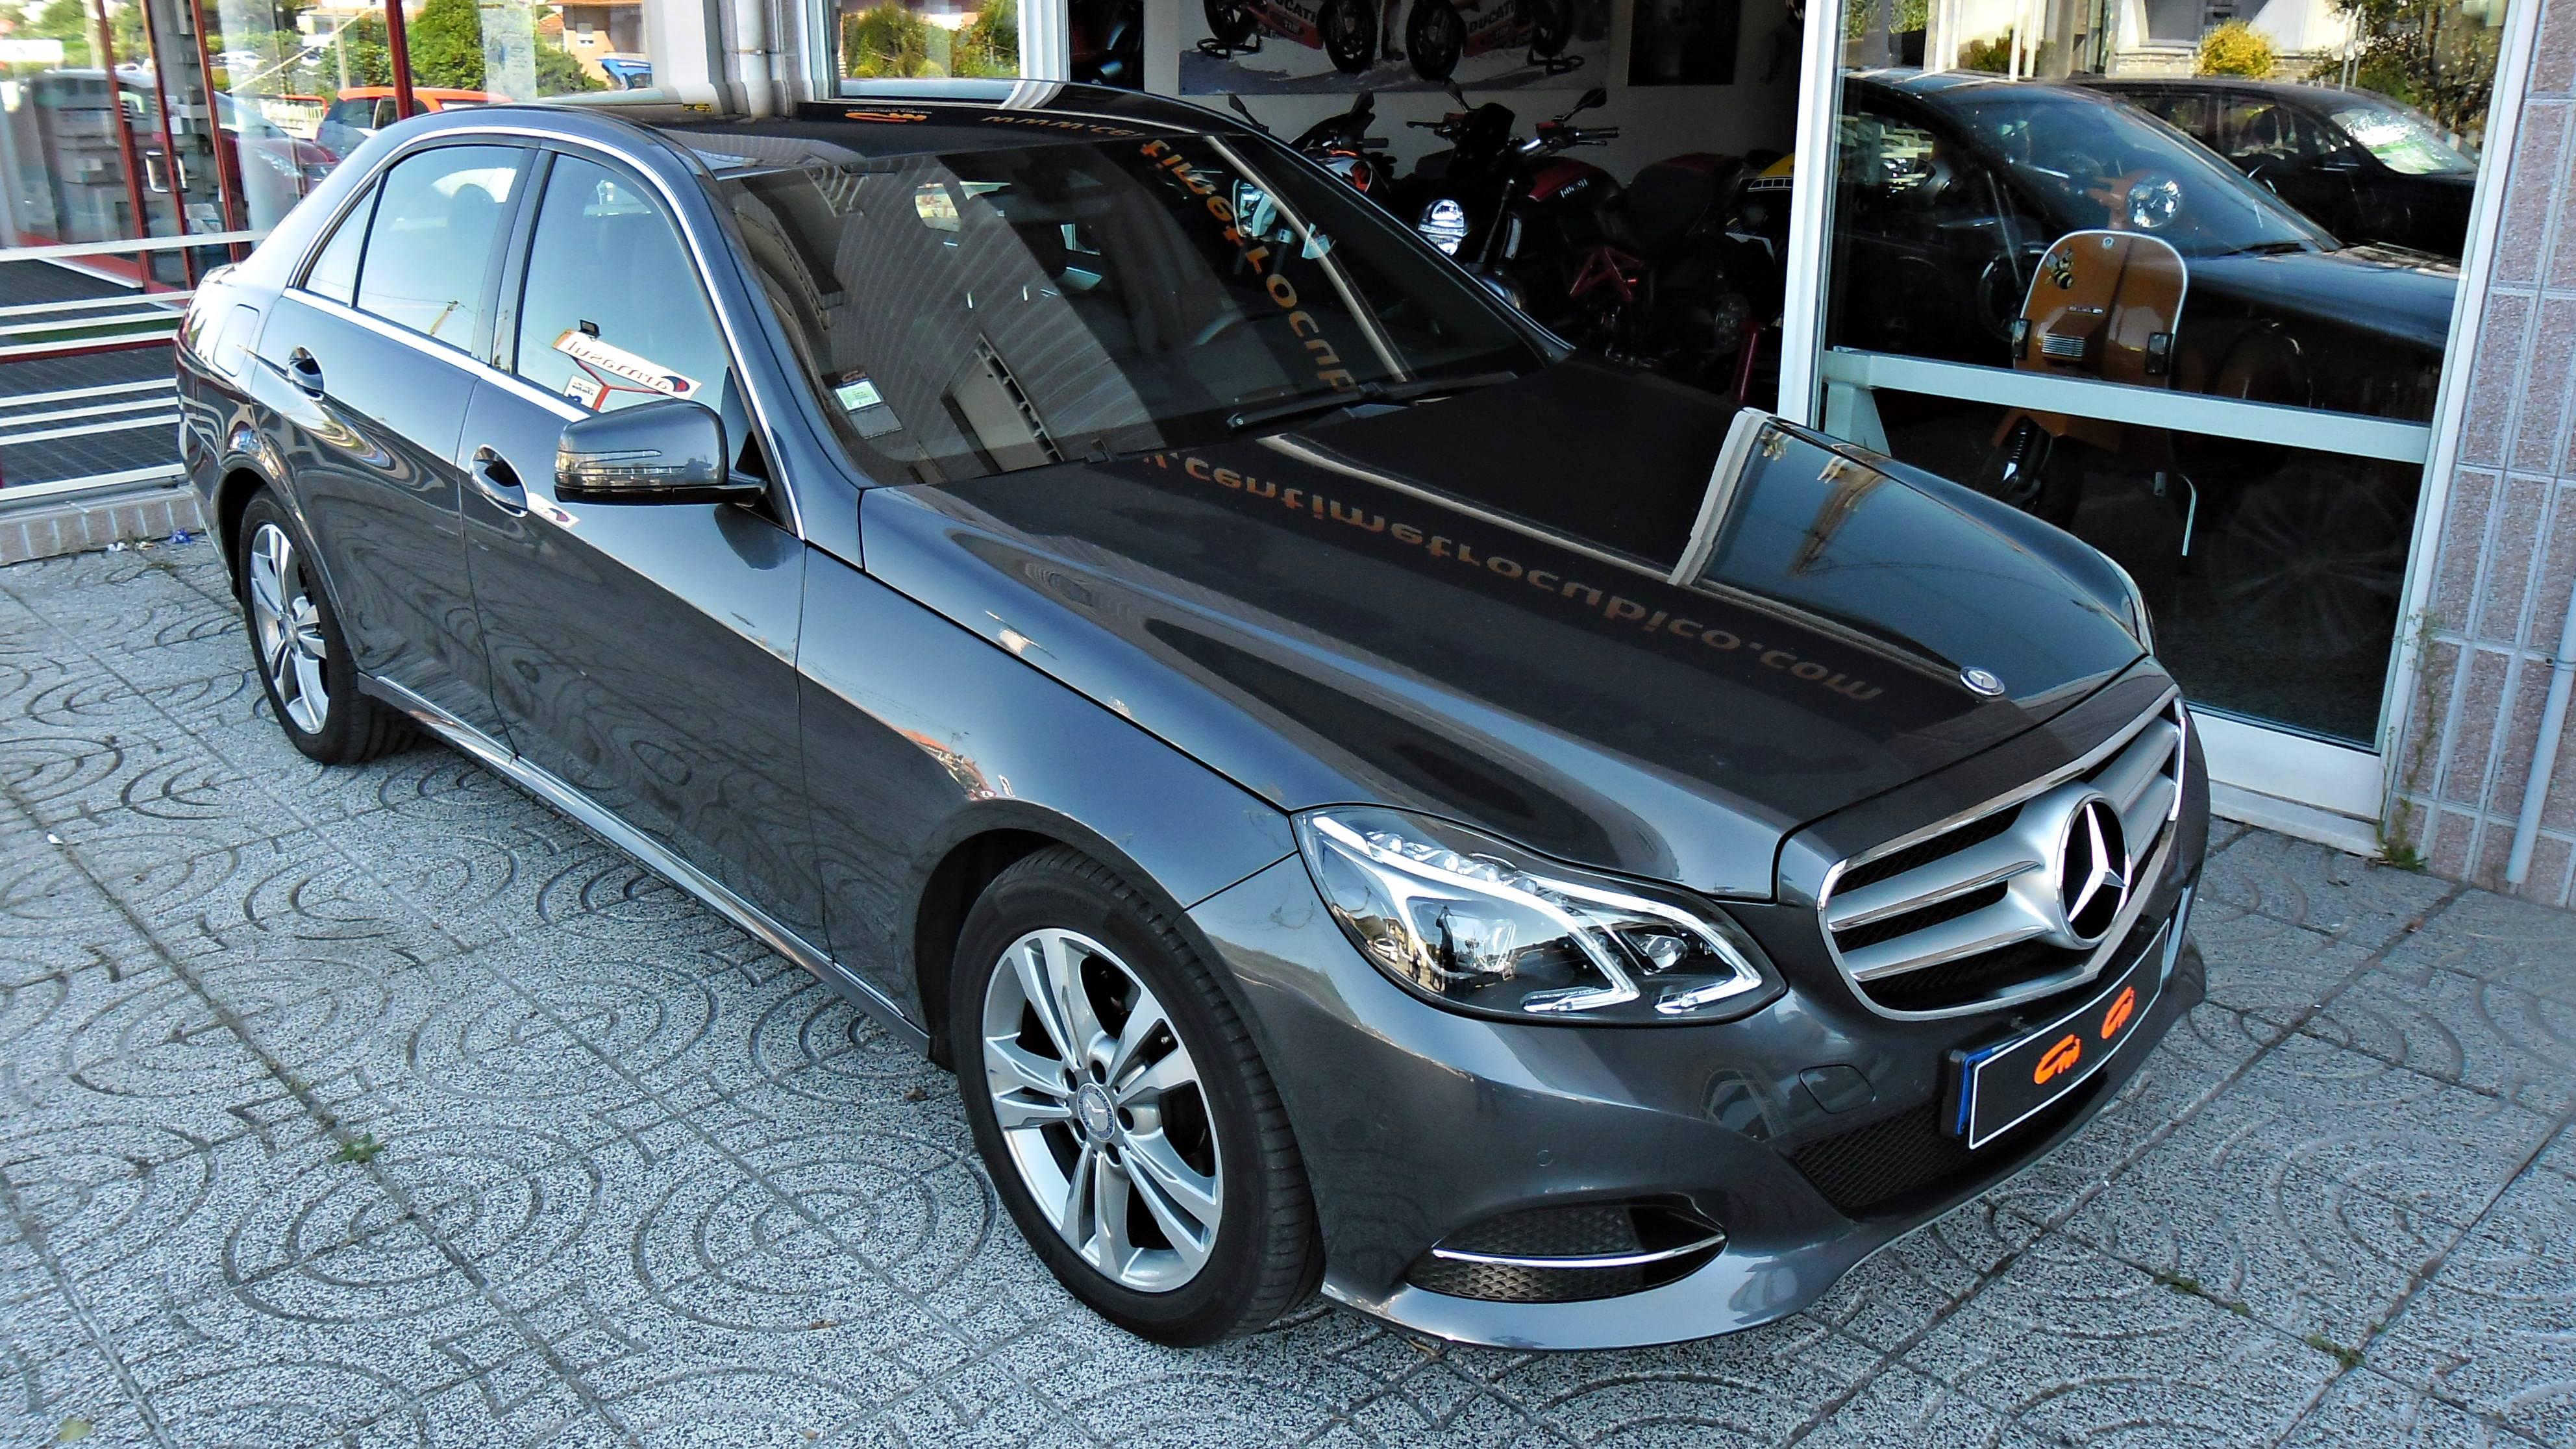 Mercedes-Benz E 250 CDI 7G Tronic